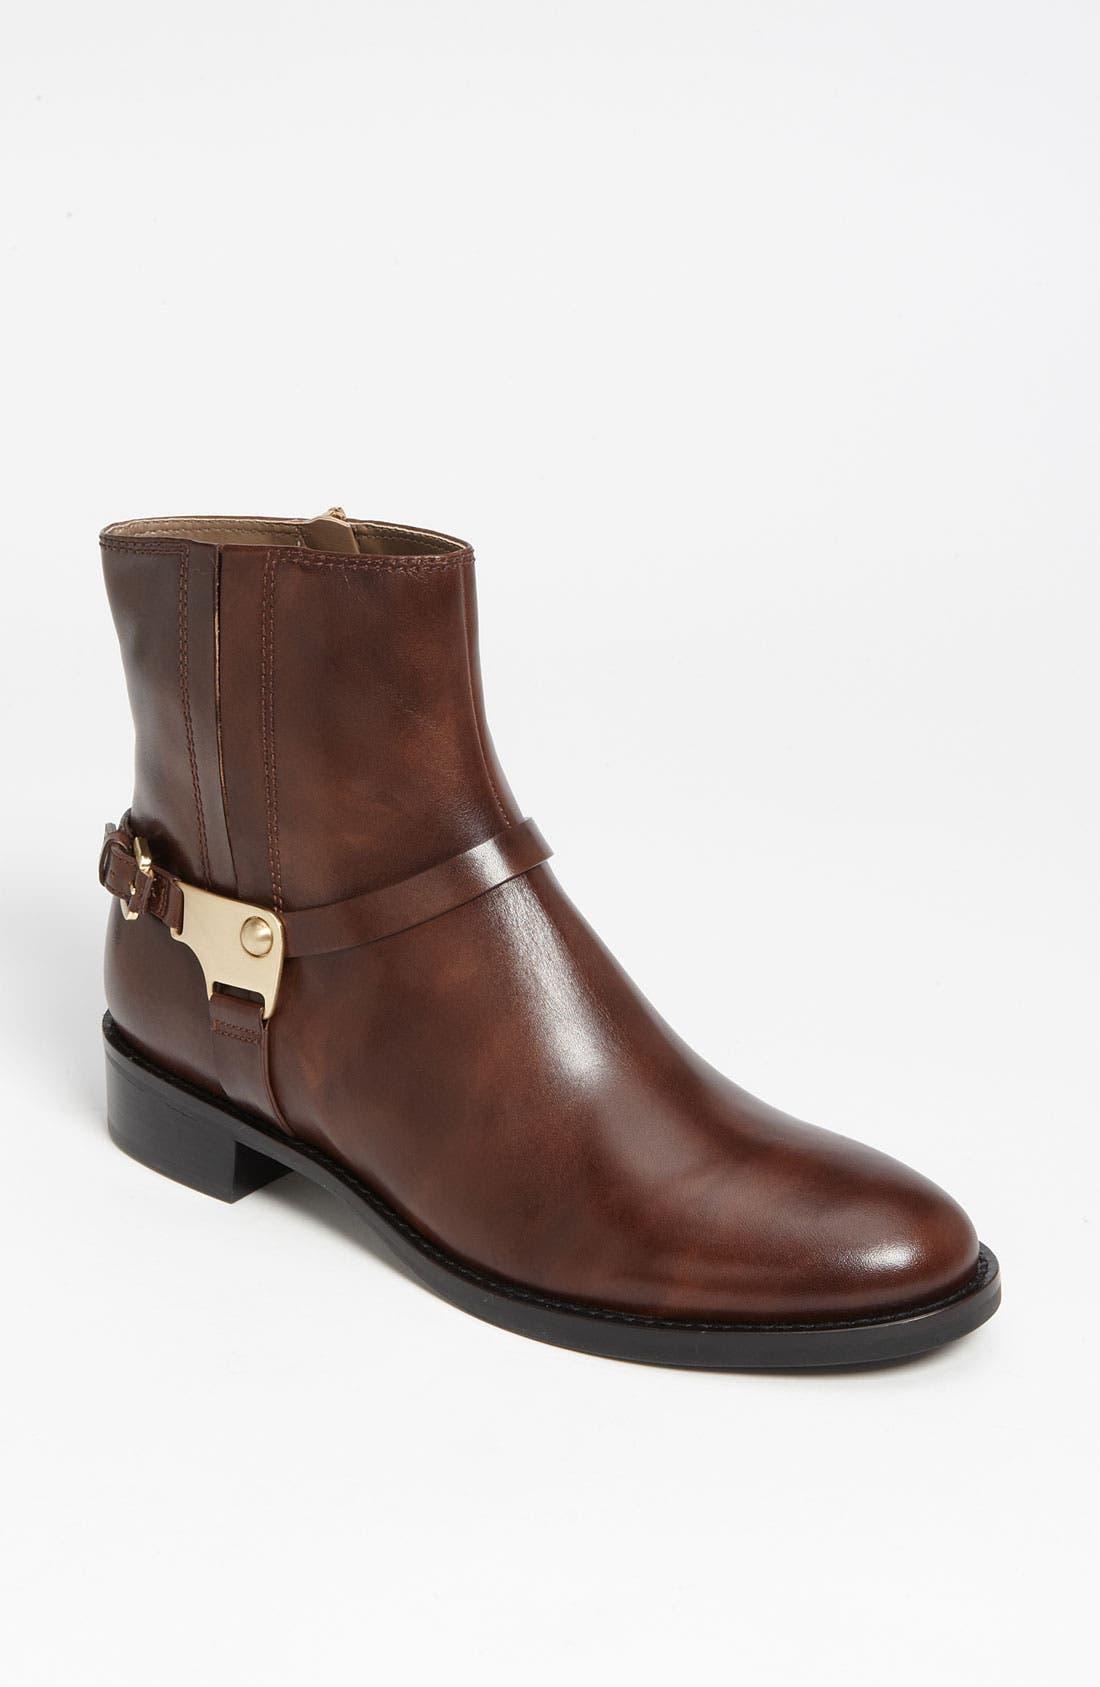 Alternate Image 1 Selected - ECCO 'Hobart Harness Buckle' Boot